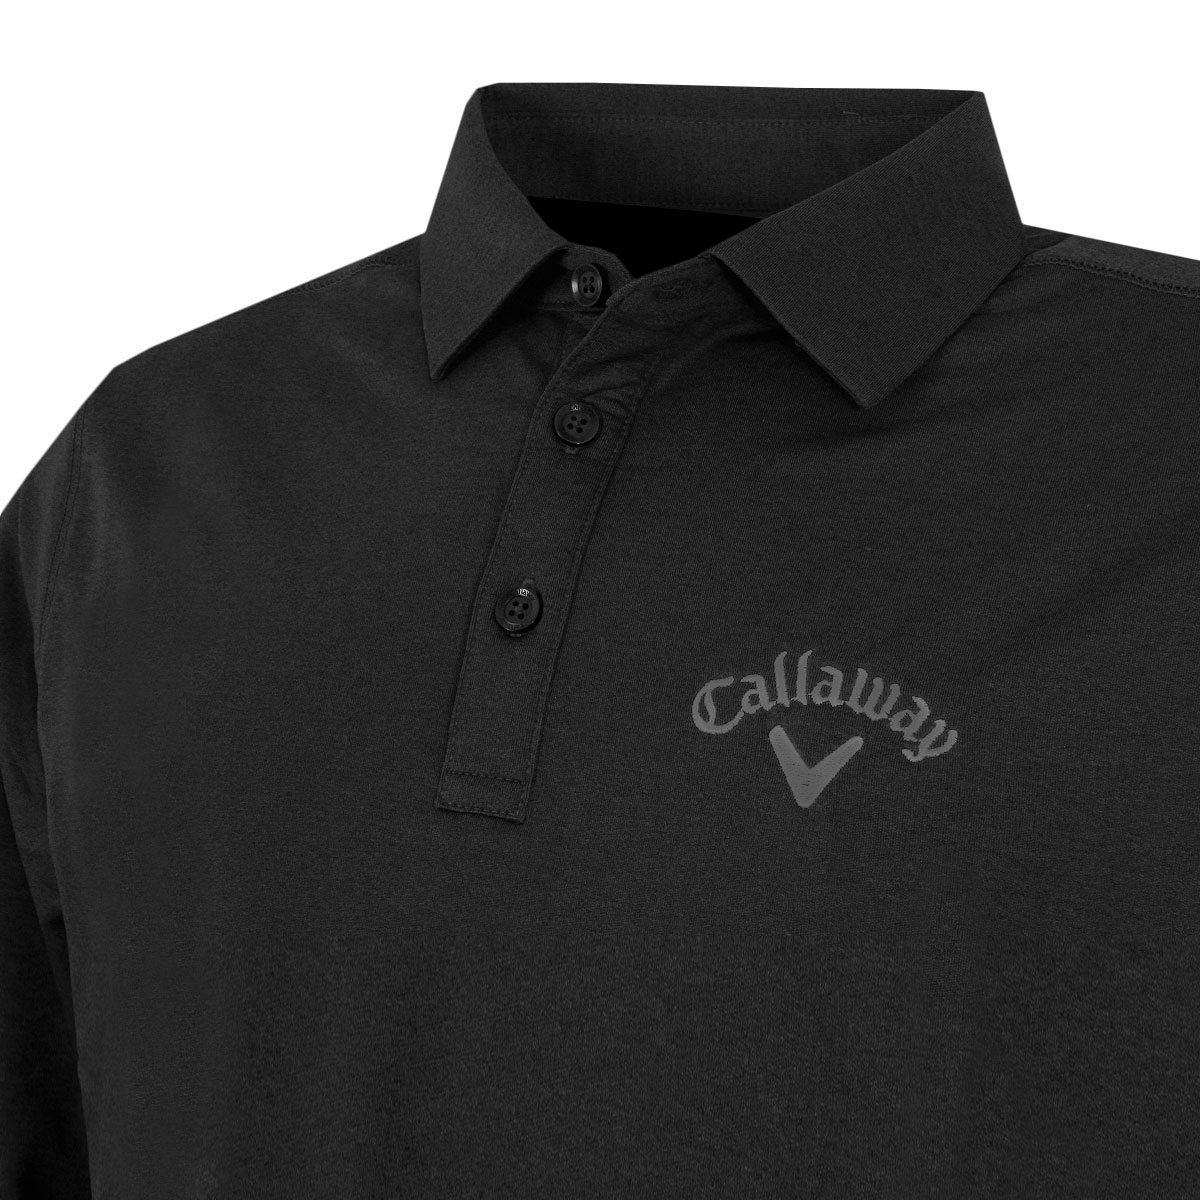 Callaway-Golf-Mens-2019-Long-Sleeve-Stretch-Opti-Dri-Polo-Shirt thumbnail 10